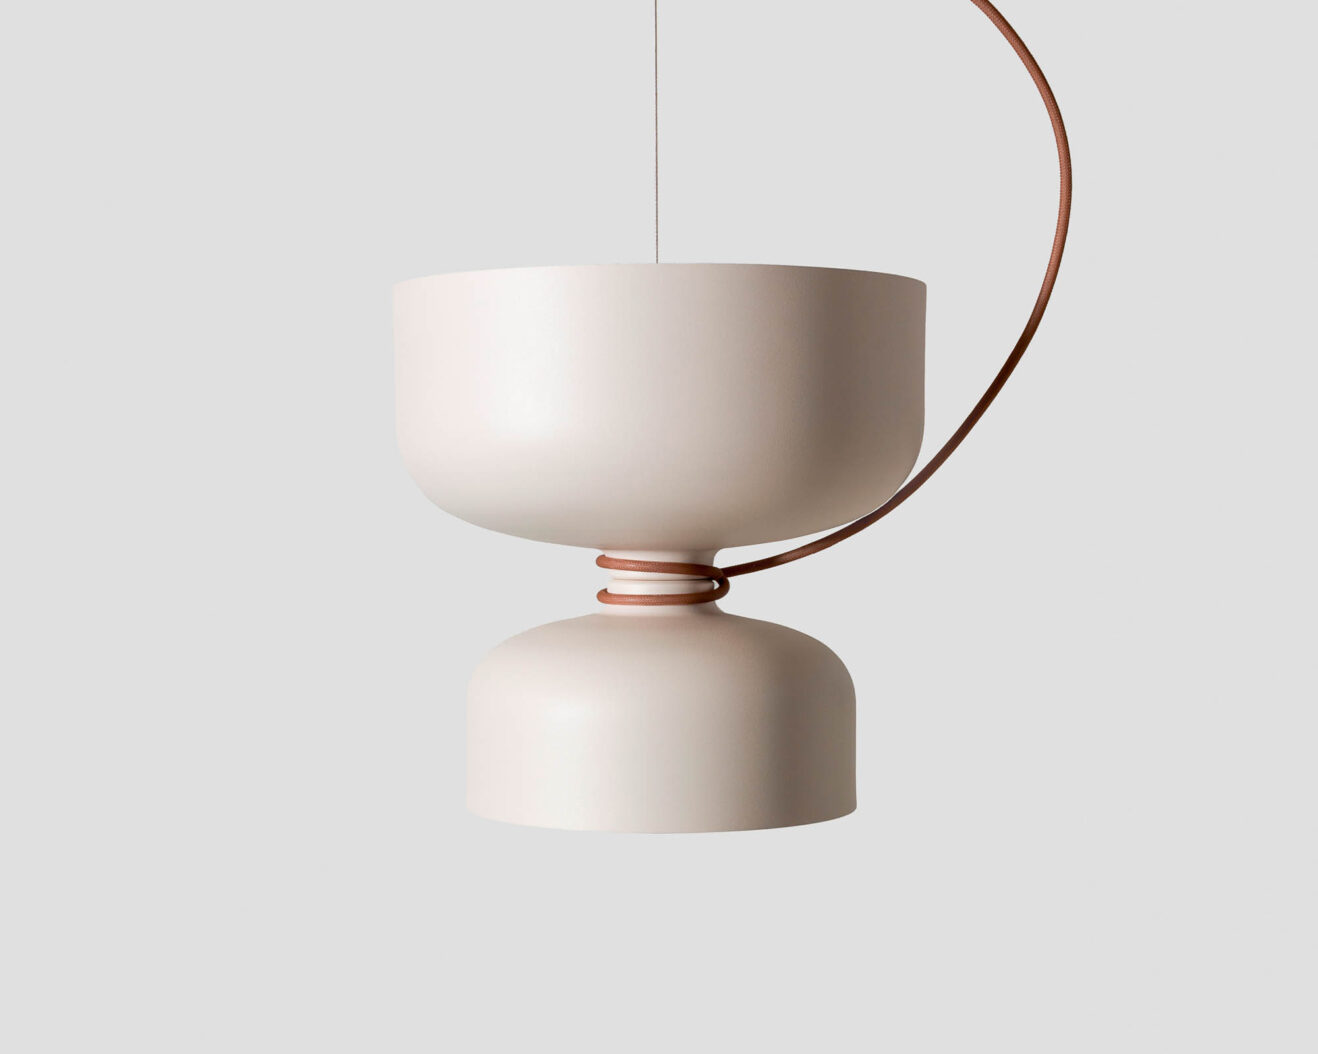 Andlight-Pendant-Lamp-AB-Vanilla-Savannah Bay Gallery